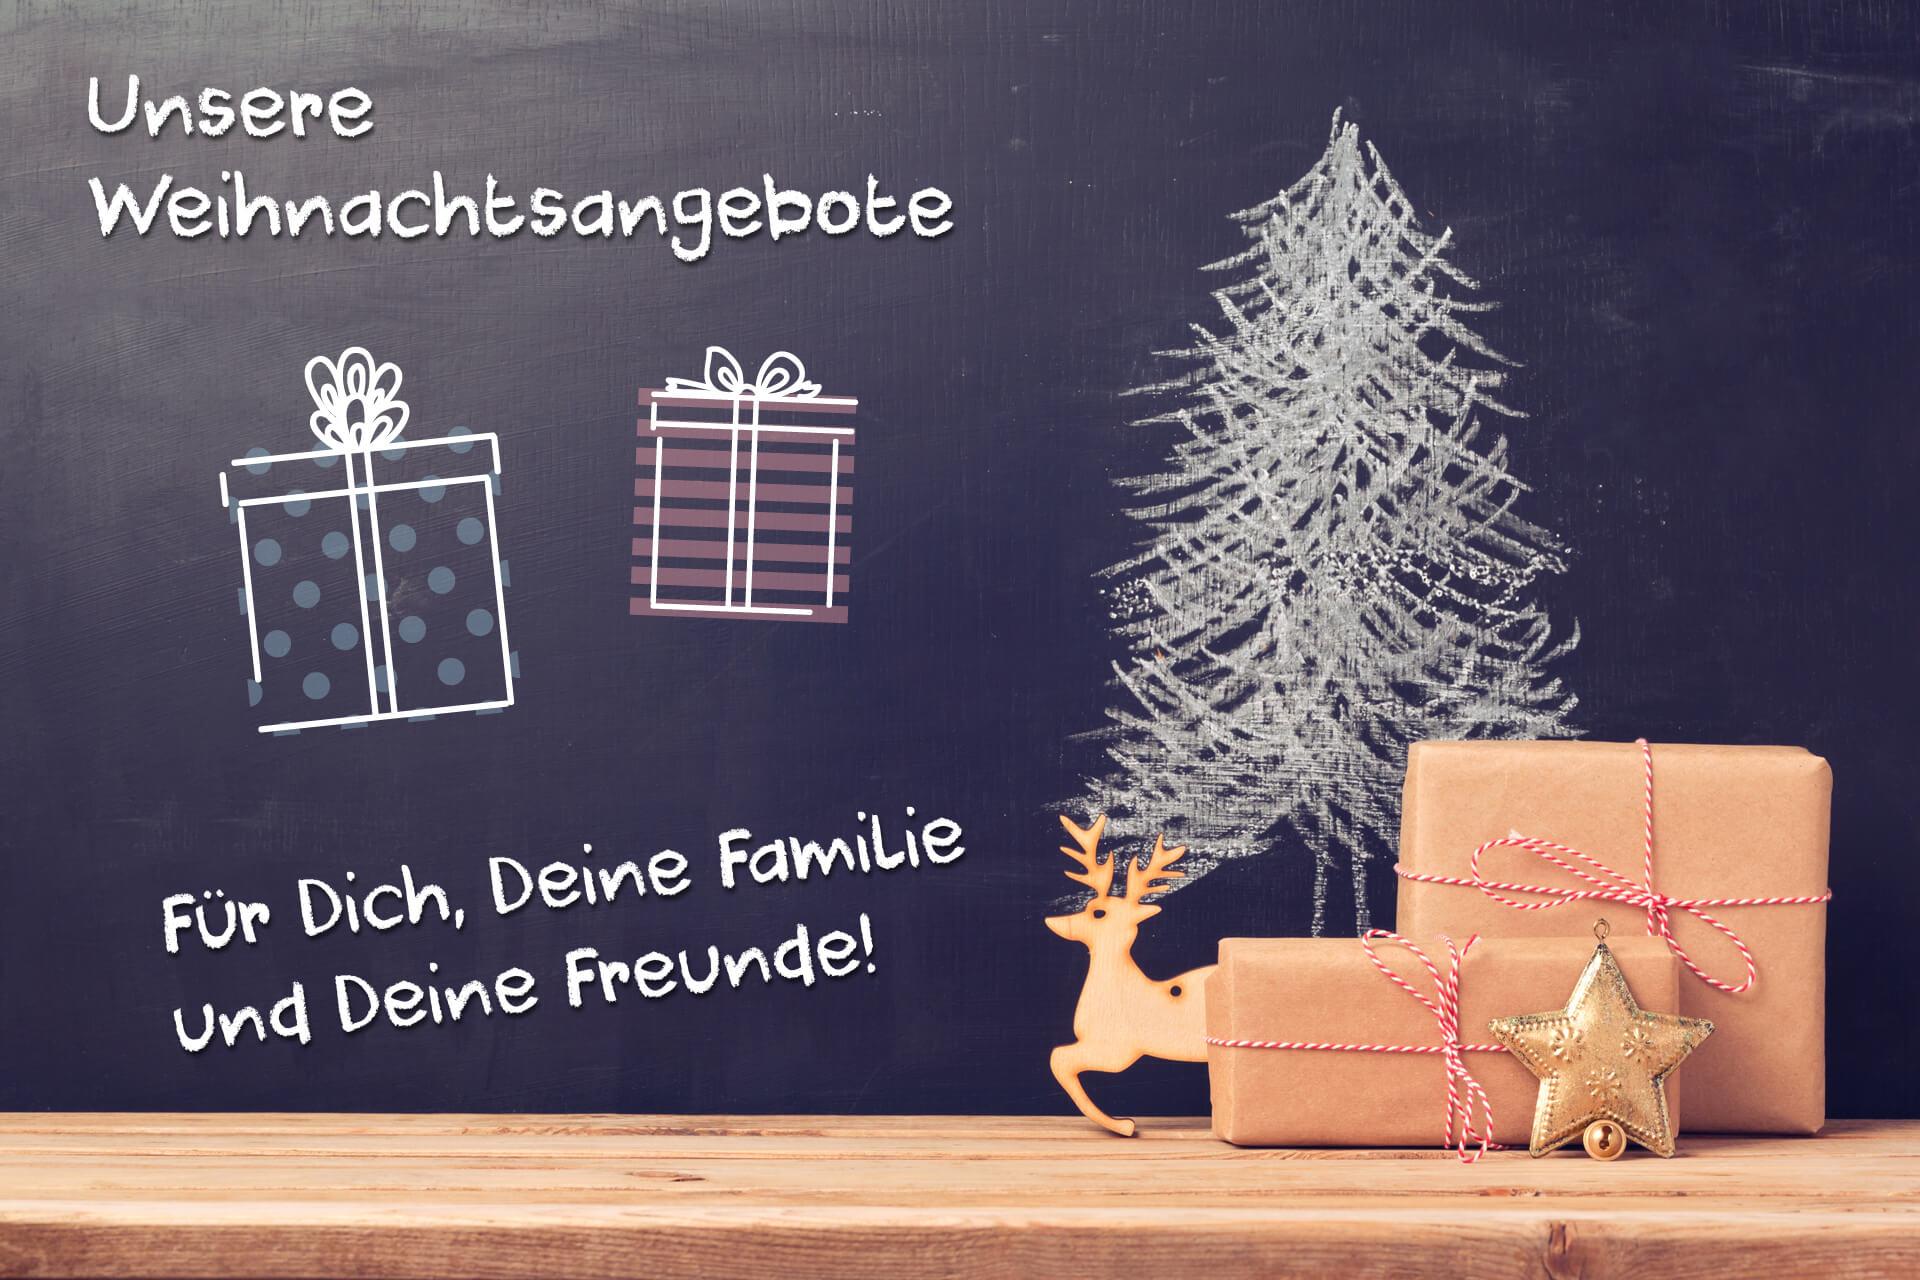 weihnachtsangebote f r freunde elixia vitalclub hamburg fitnessstudio langenhorn. Black Bedroom Furniture Sets. Home Design Ideas